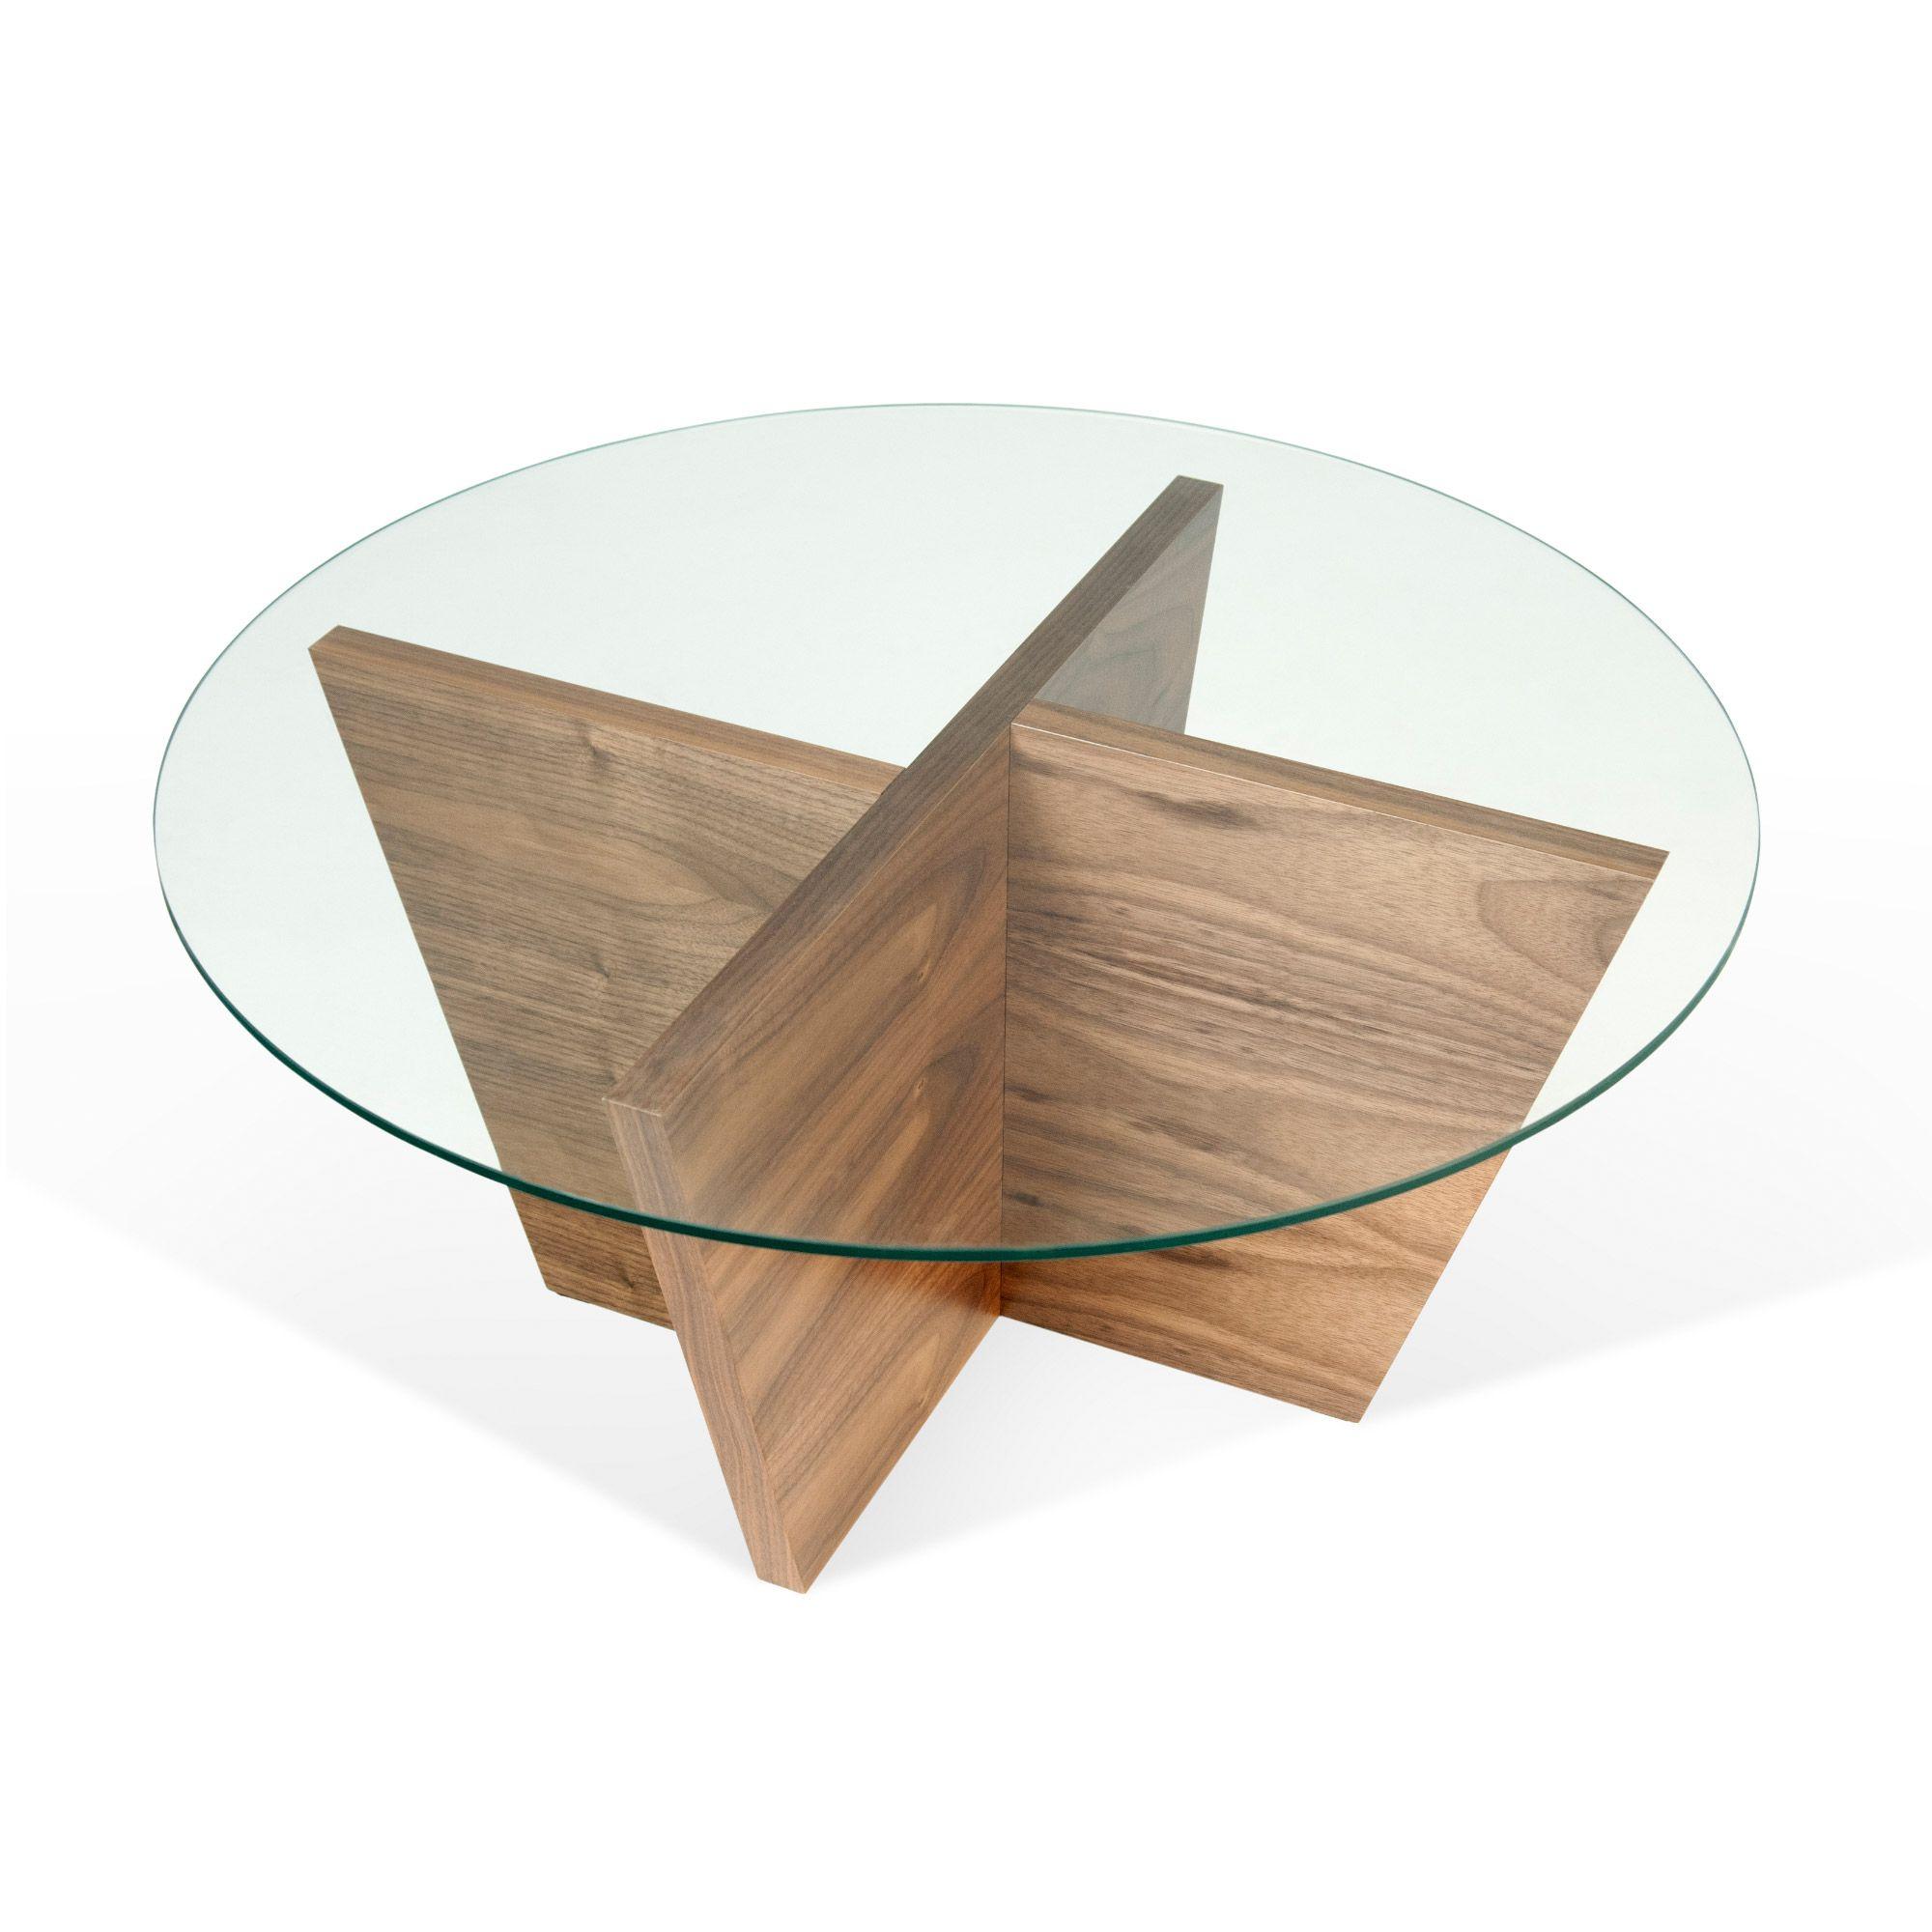 Table Basse Design Ronde En Bois Plateau Verre Diam80cm Oliva